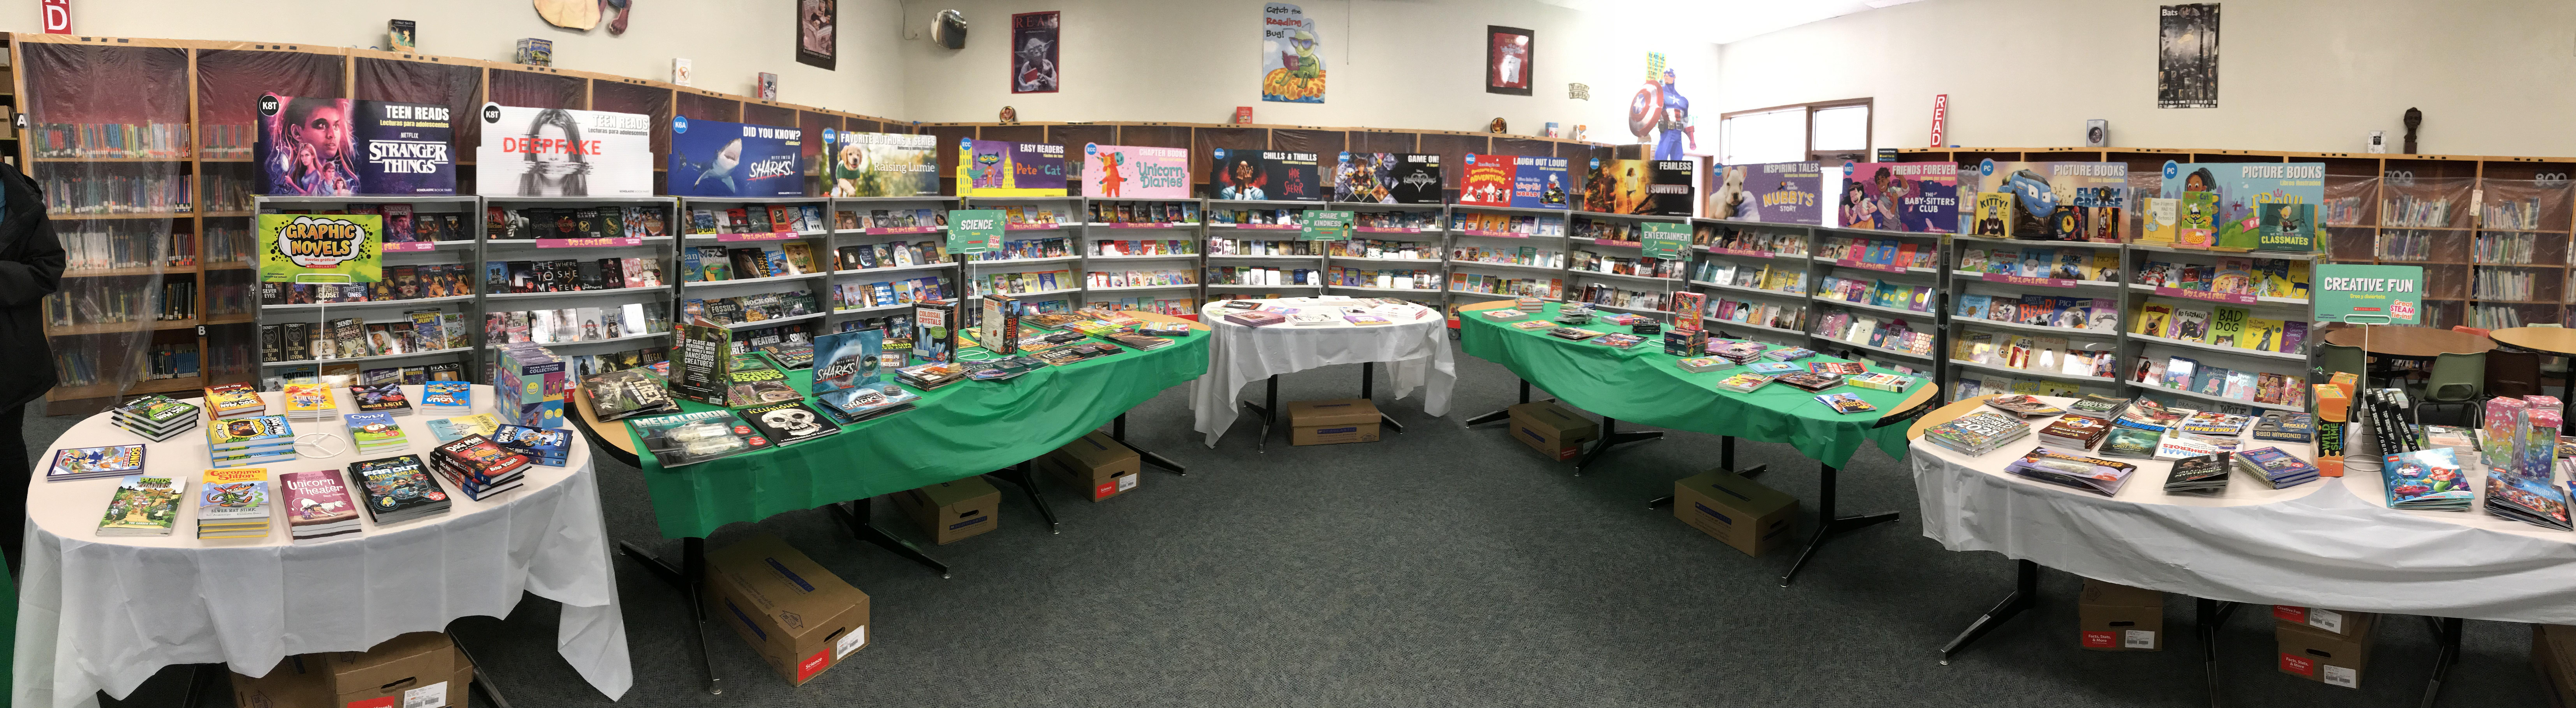 Book Fair Display